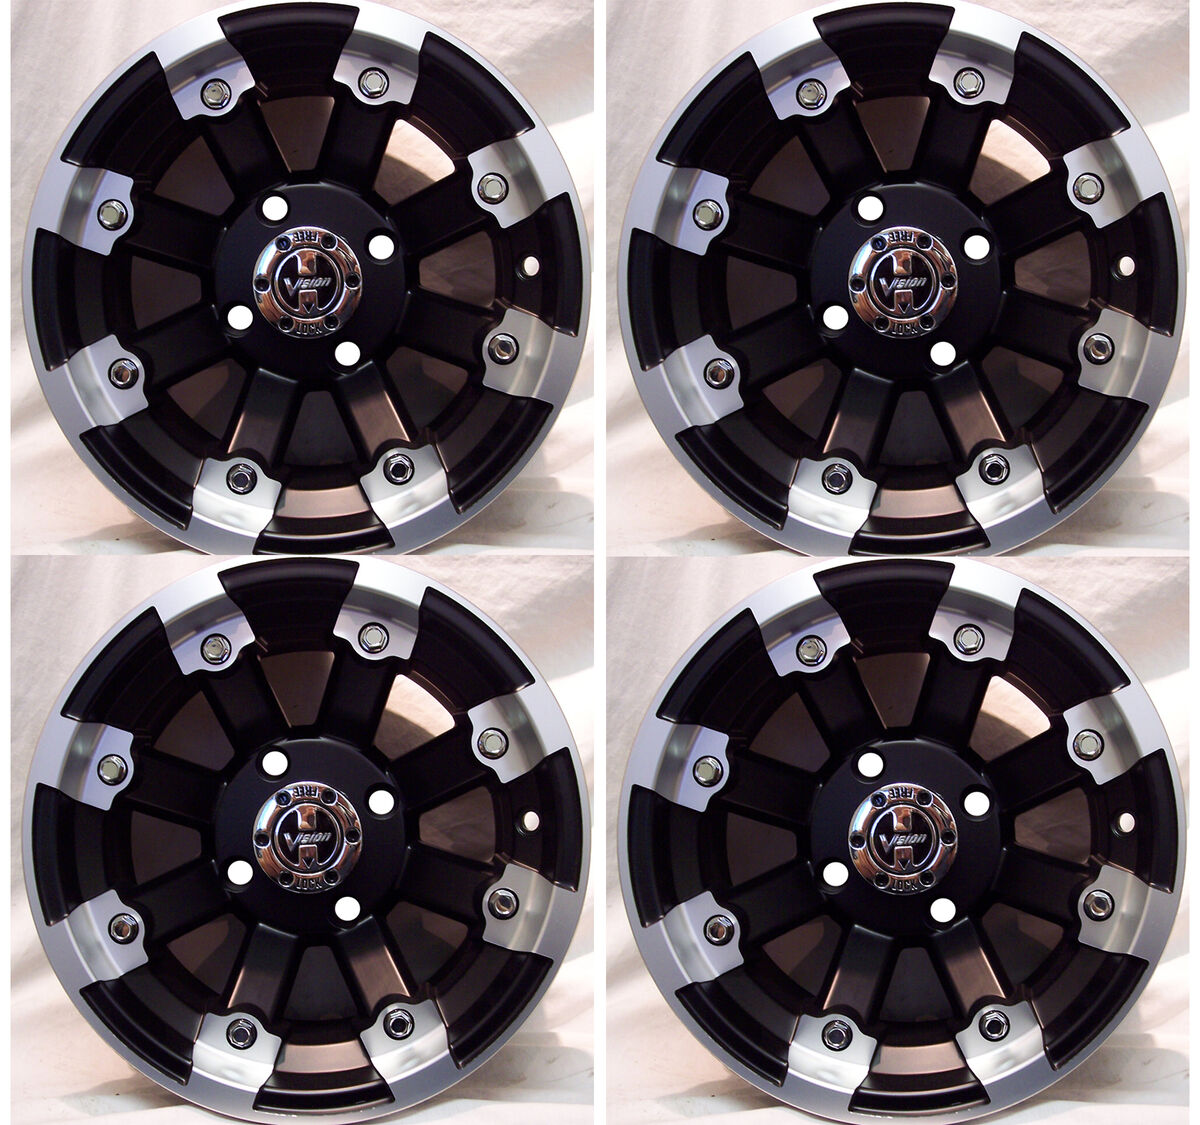 "4 12"" Rims Wheels for 2005 2013 Suzuki King Quad 750 IE w IRS 393 MBML Aluminum"